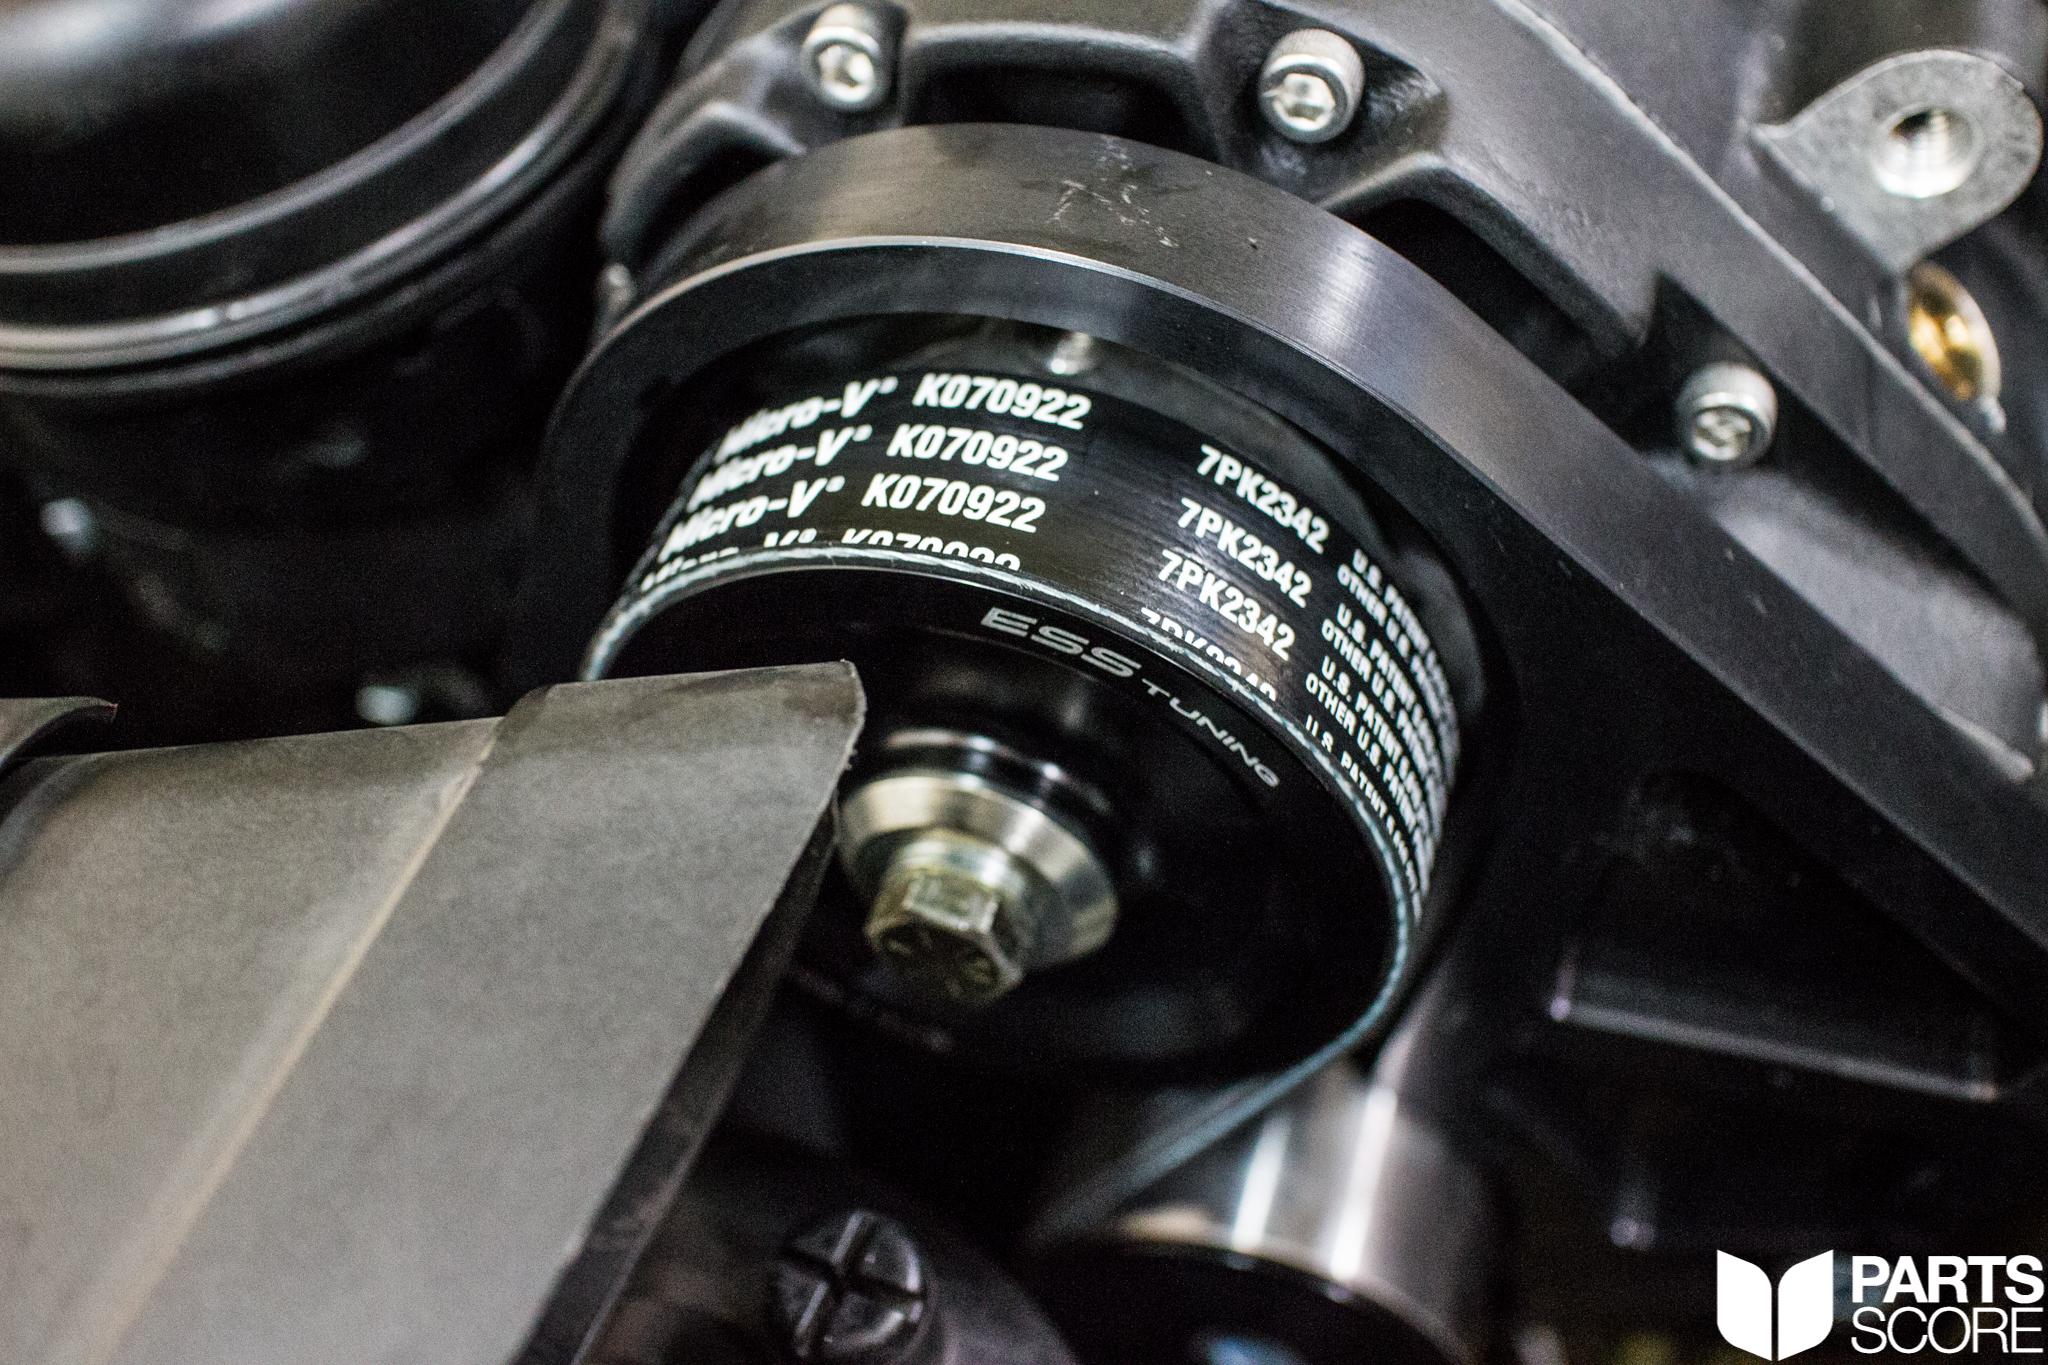 ess tuning. partsscore, bmw, m3, bmwm3, e46, e46m3, esstuning, supercharger, supercharged, esstuningsupercharger, vortech, vortechv3si, superchargedm3, boost, racecar, supercar, bmwm, bmwmperformance, bmwmpower, bmwgram, phoenix, phoenixyellow, slicktop, parts score,